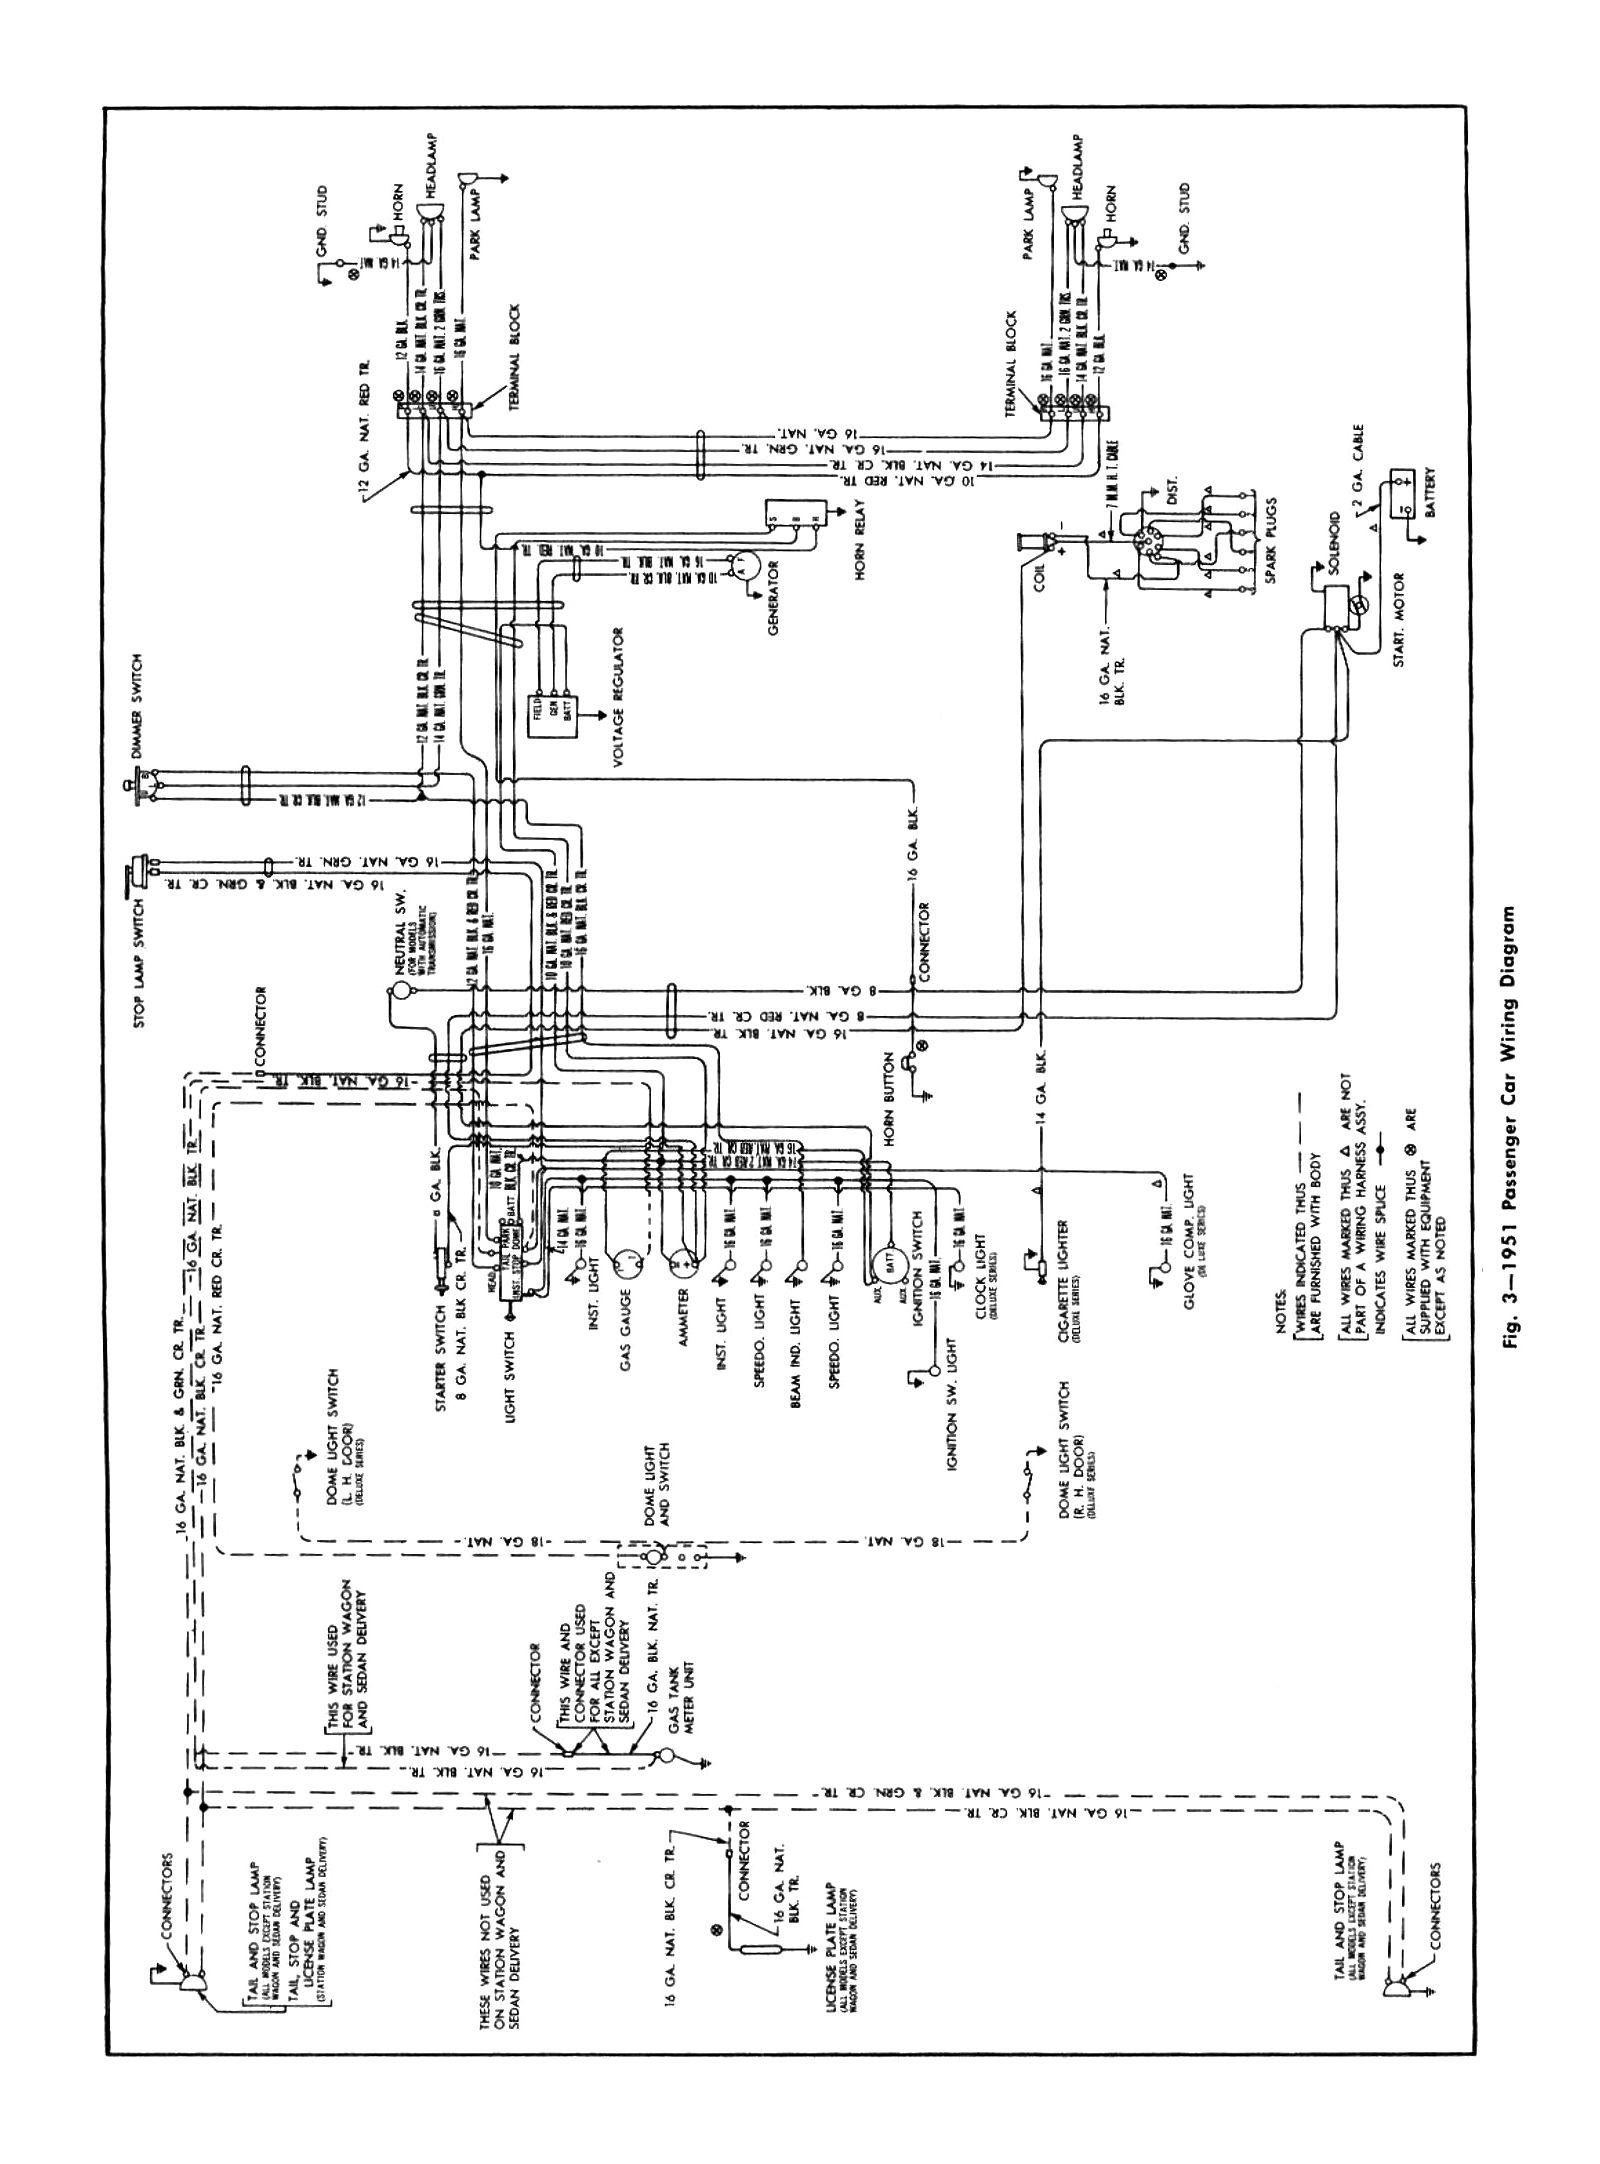 Super 1951 Chevy Wiring Harness Wiring Diagram Wiring Cloud Waroletkolfr09Org